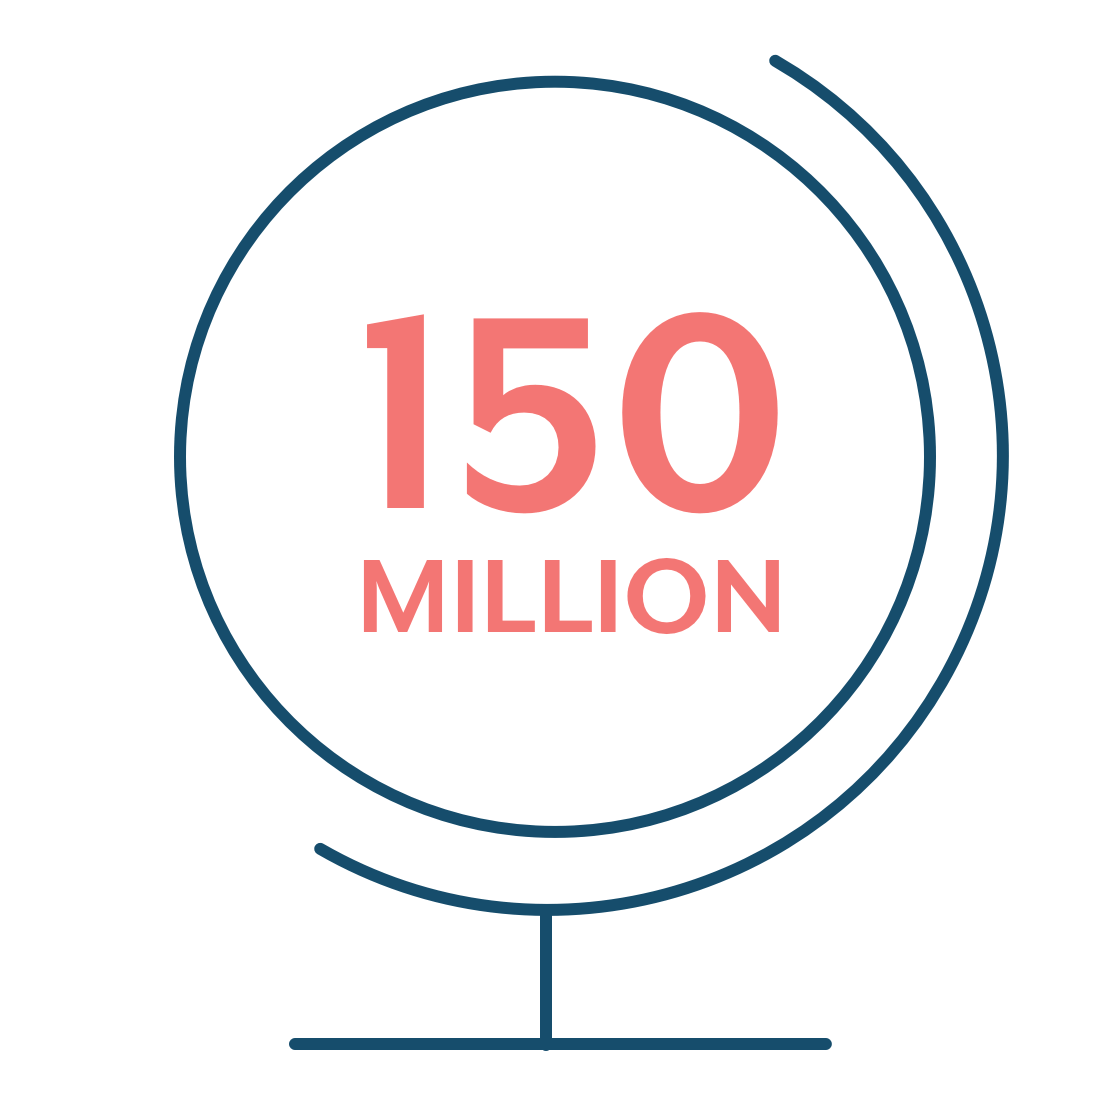 150 million people get UTIs each year globally